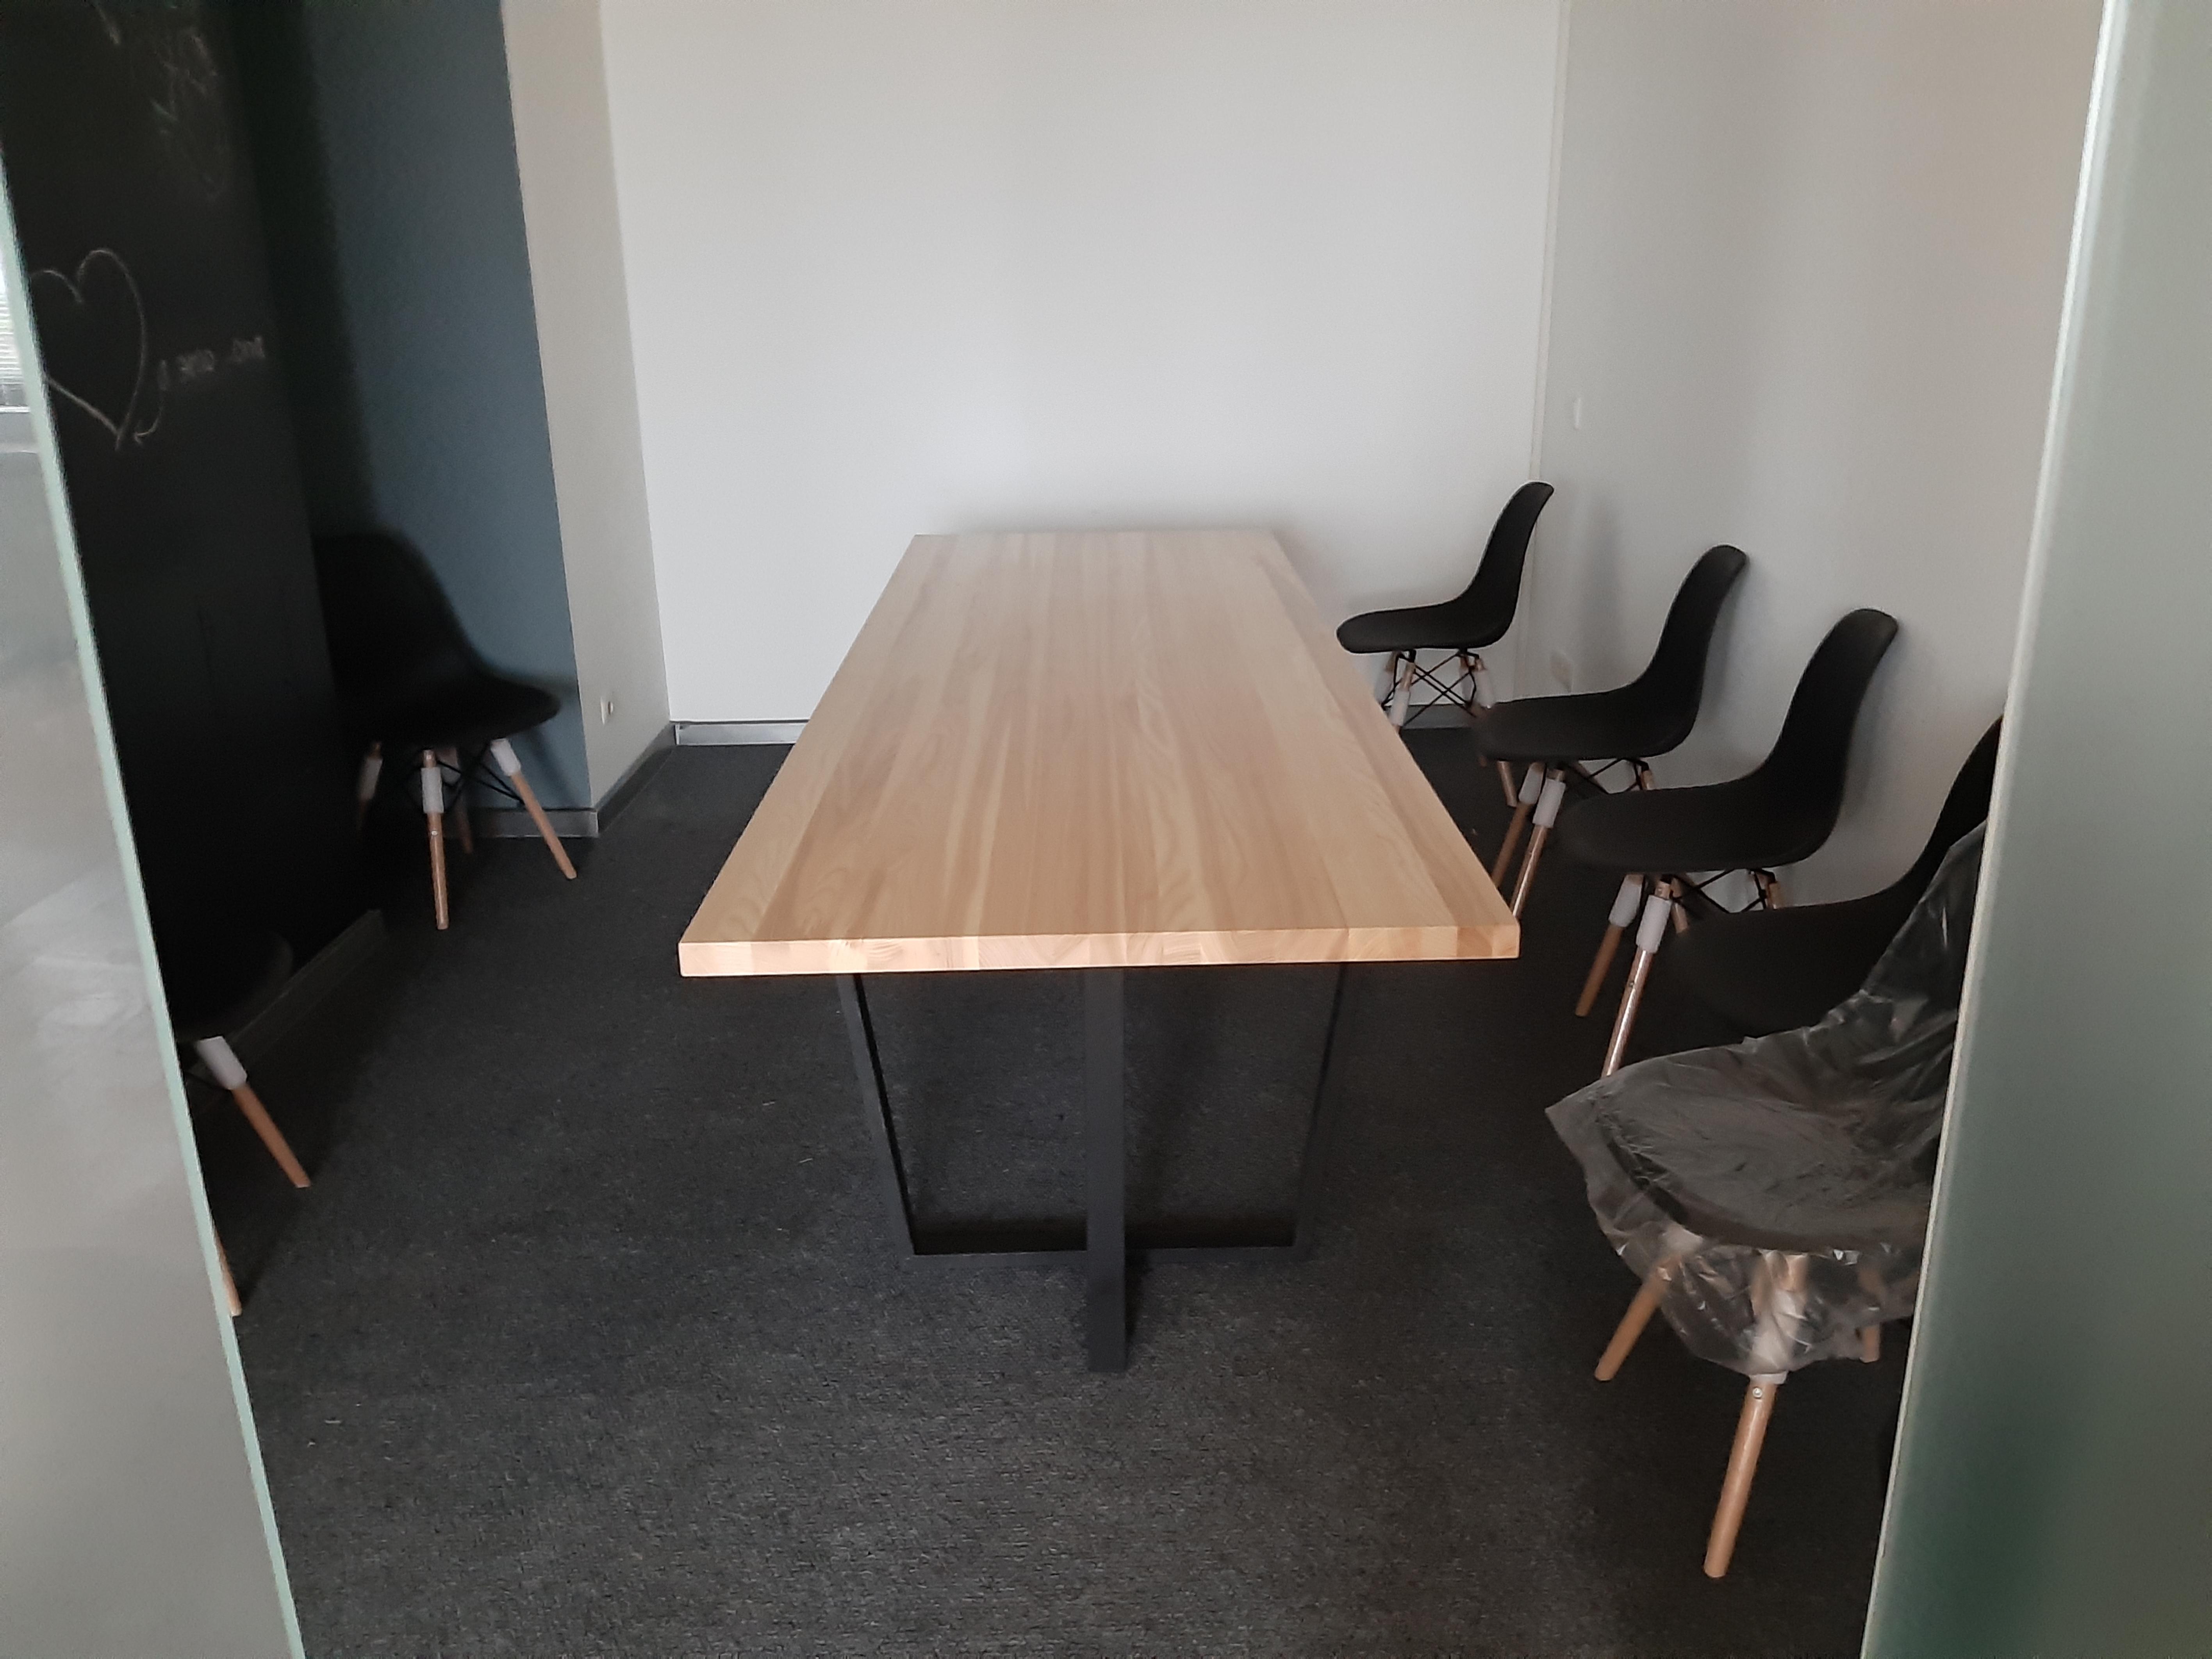 Фото Сборка большого стола в комнату для совещаний